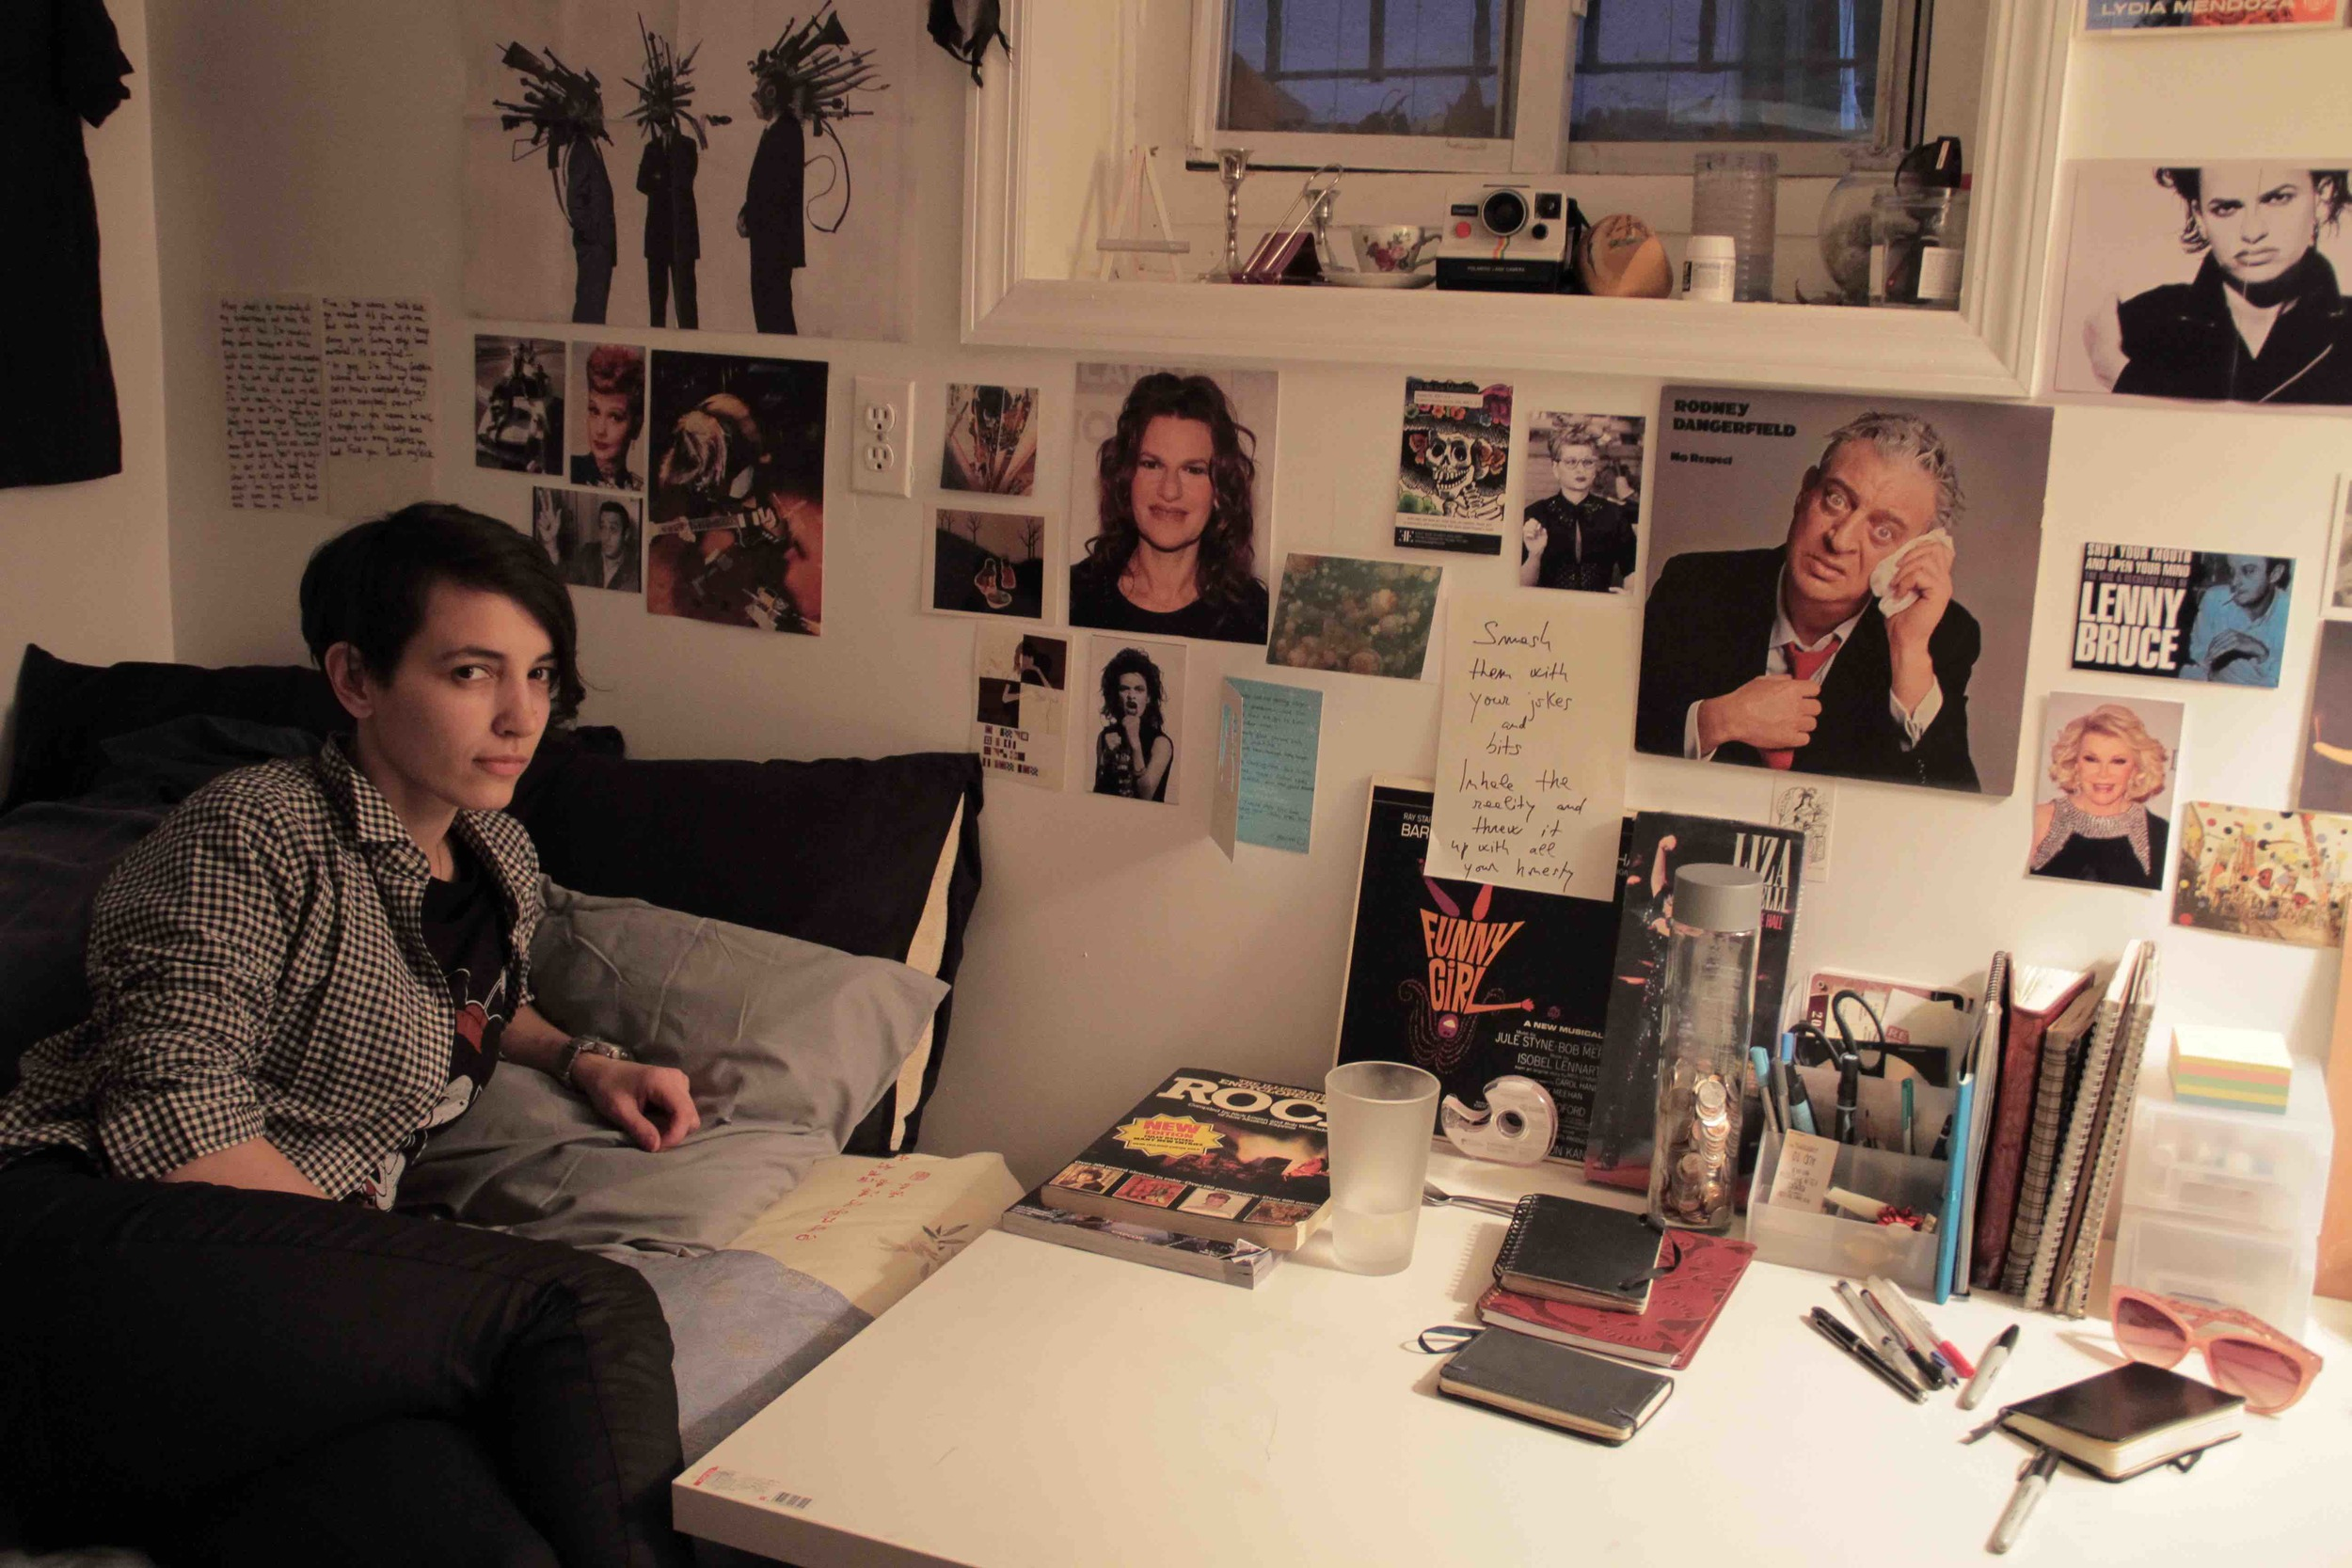 production designer Andreea Drogeanu on MUCK set - photo credit Andreea Drogeanu.jpg